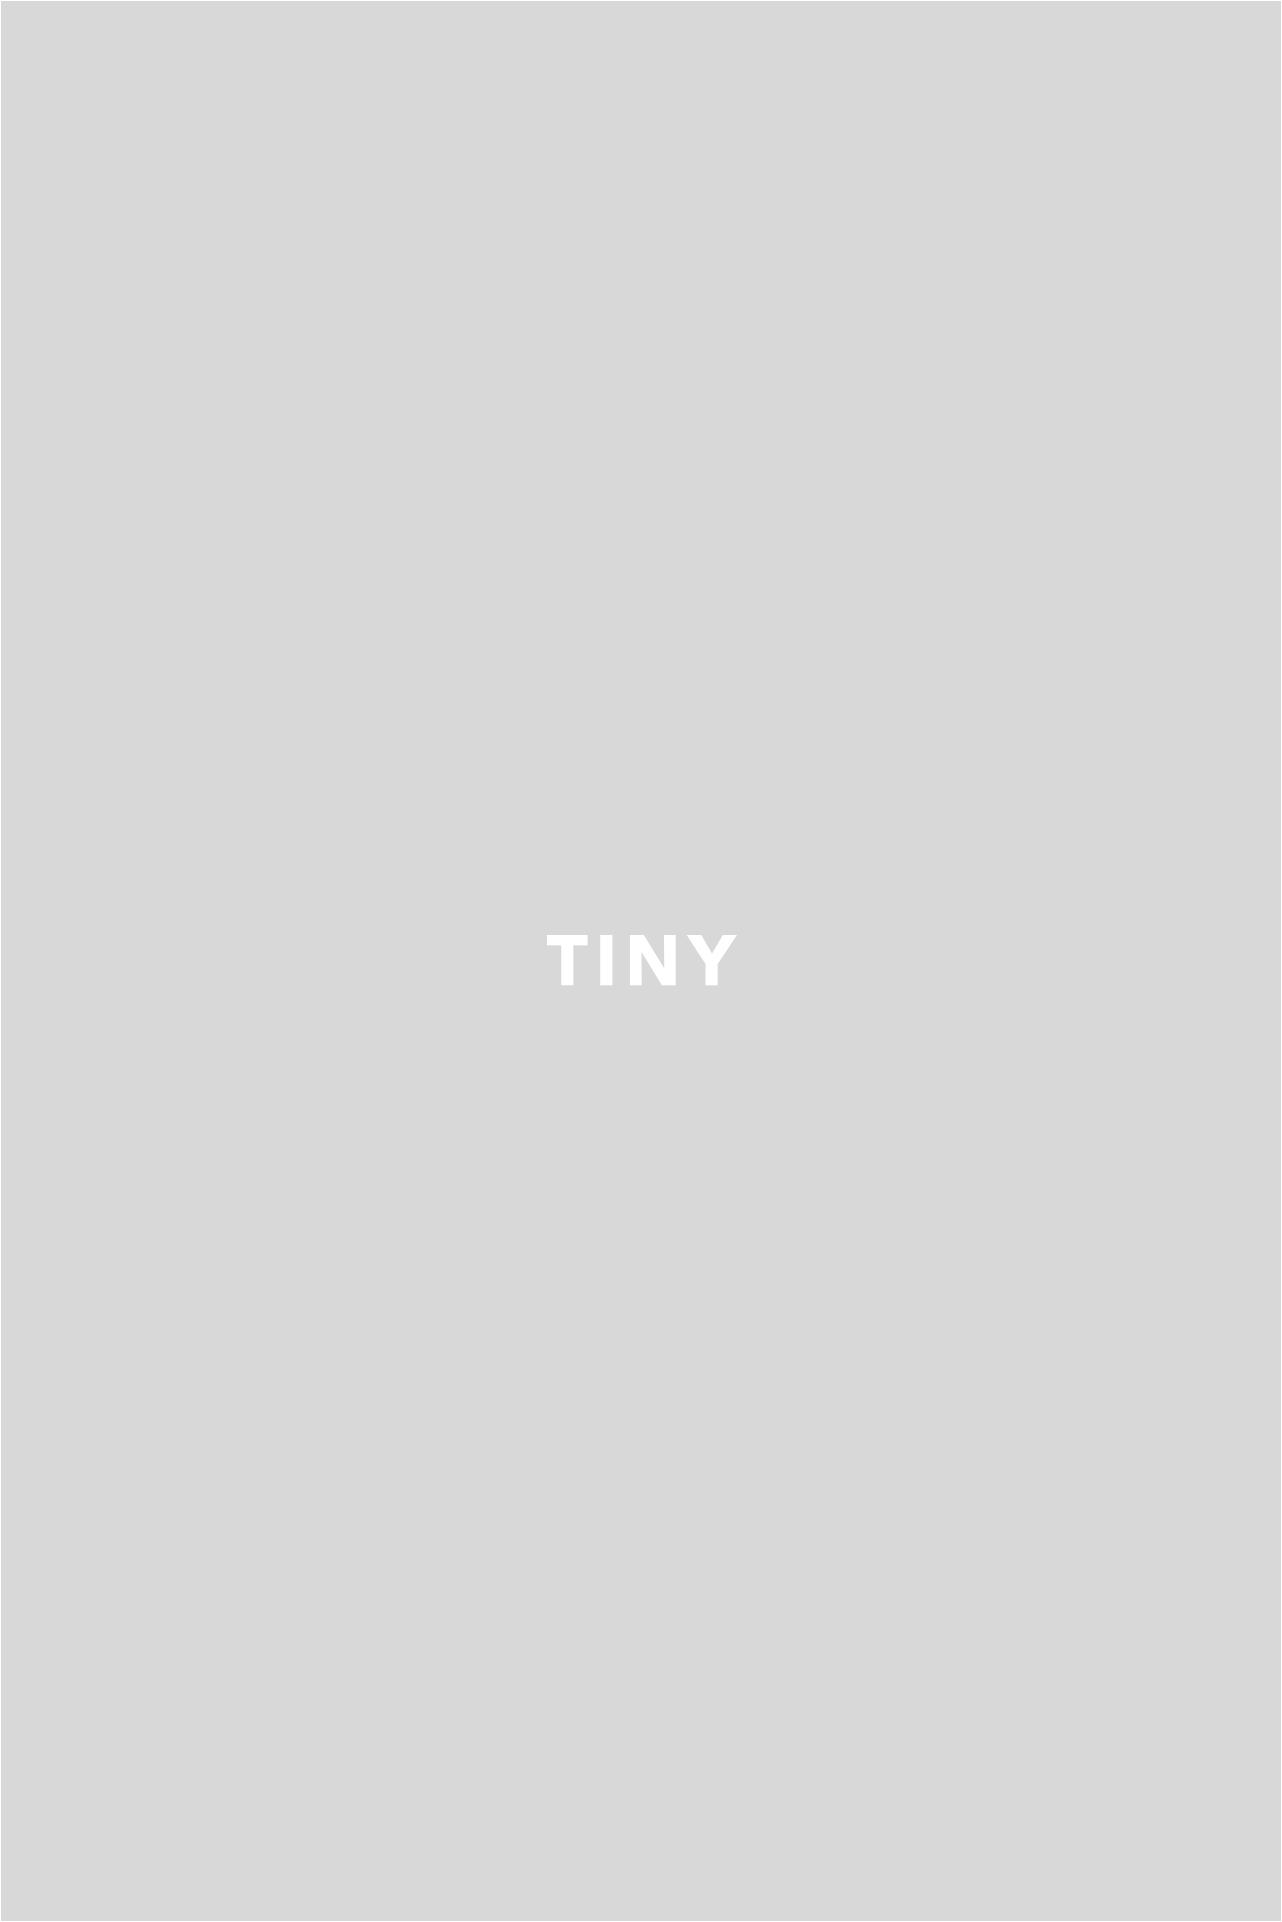 KIKKERLAND - Natural Bamboo Straws + Brush